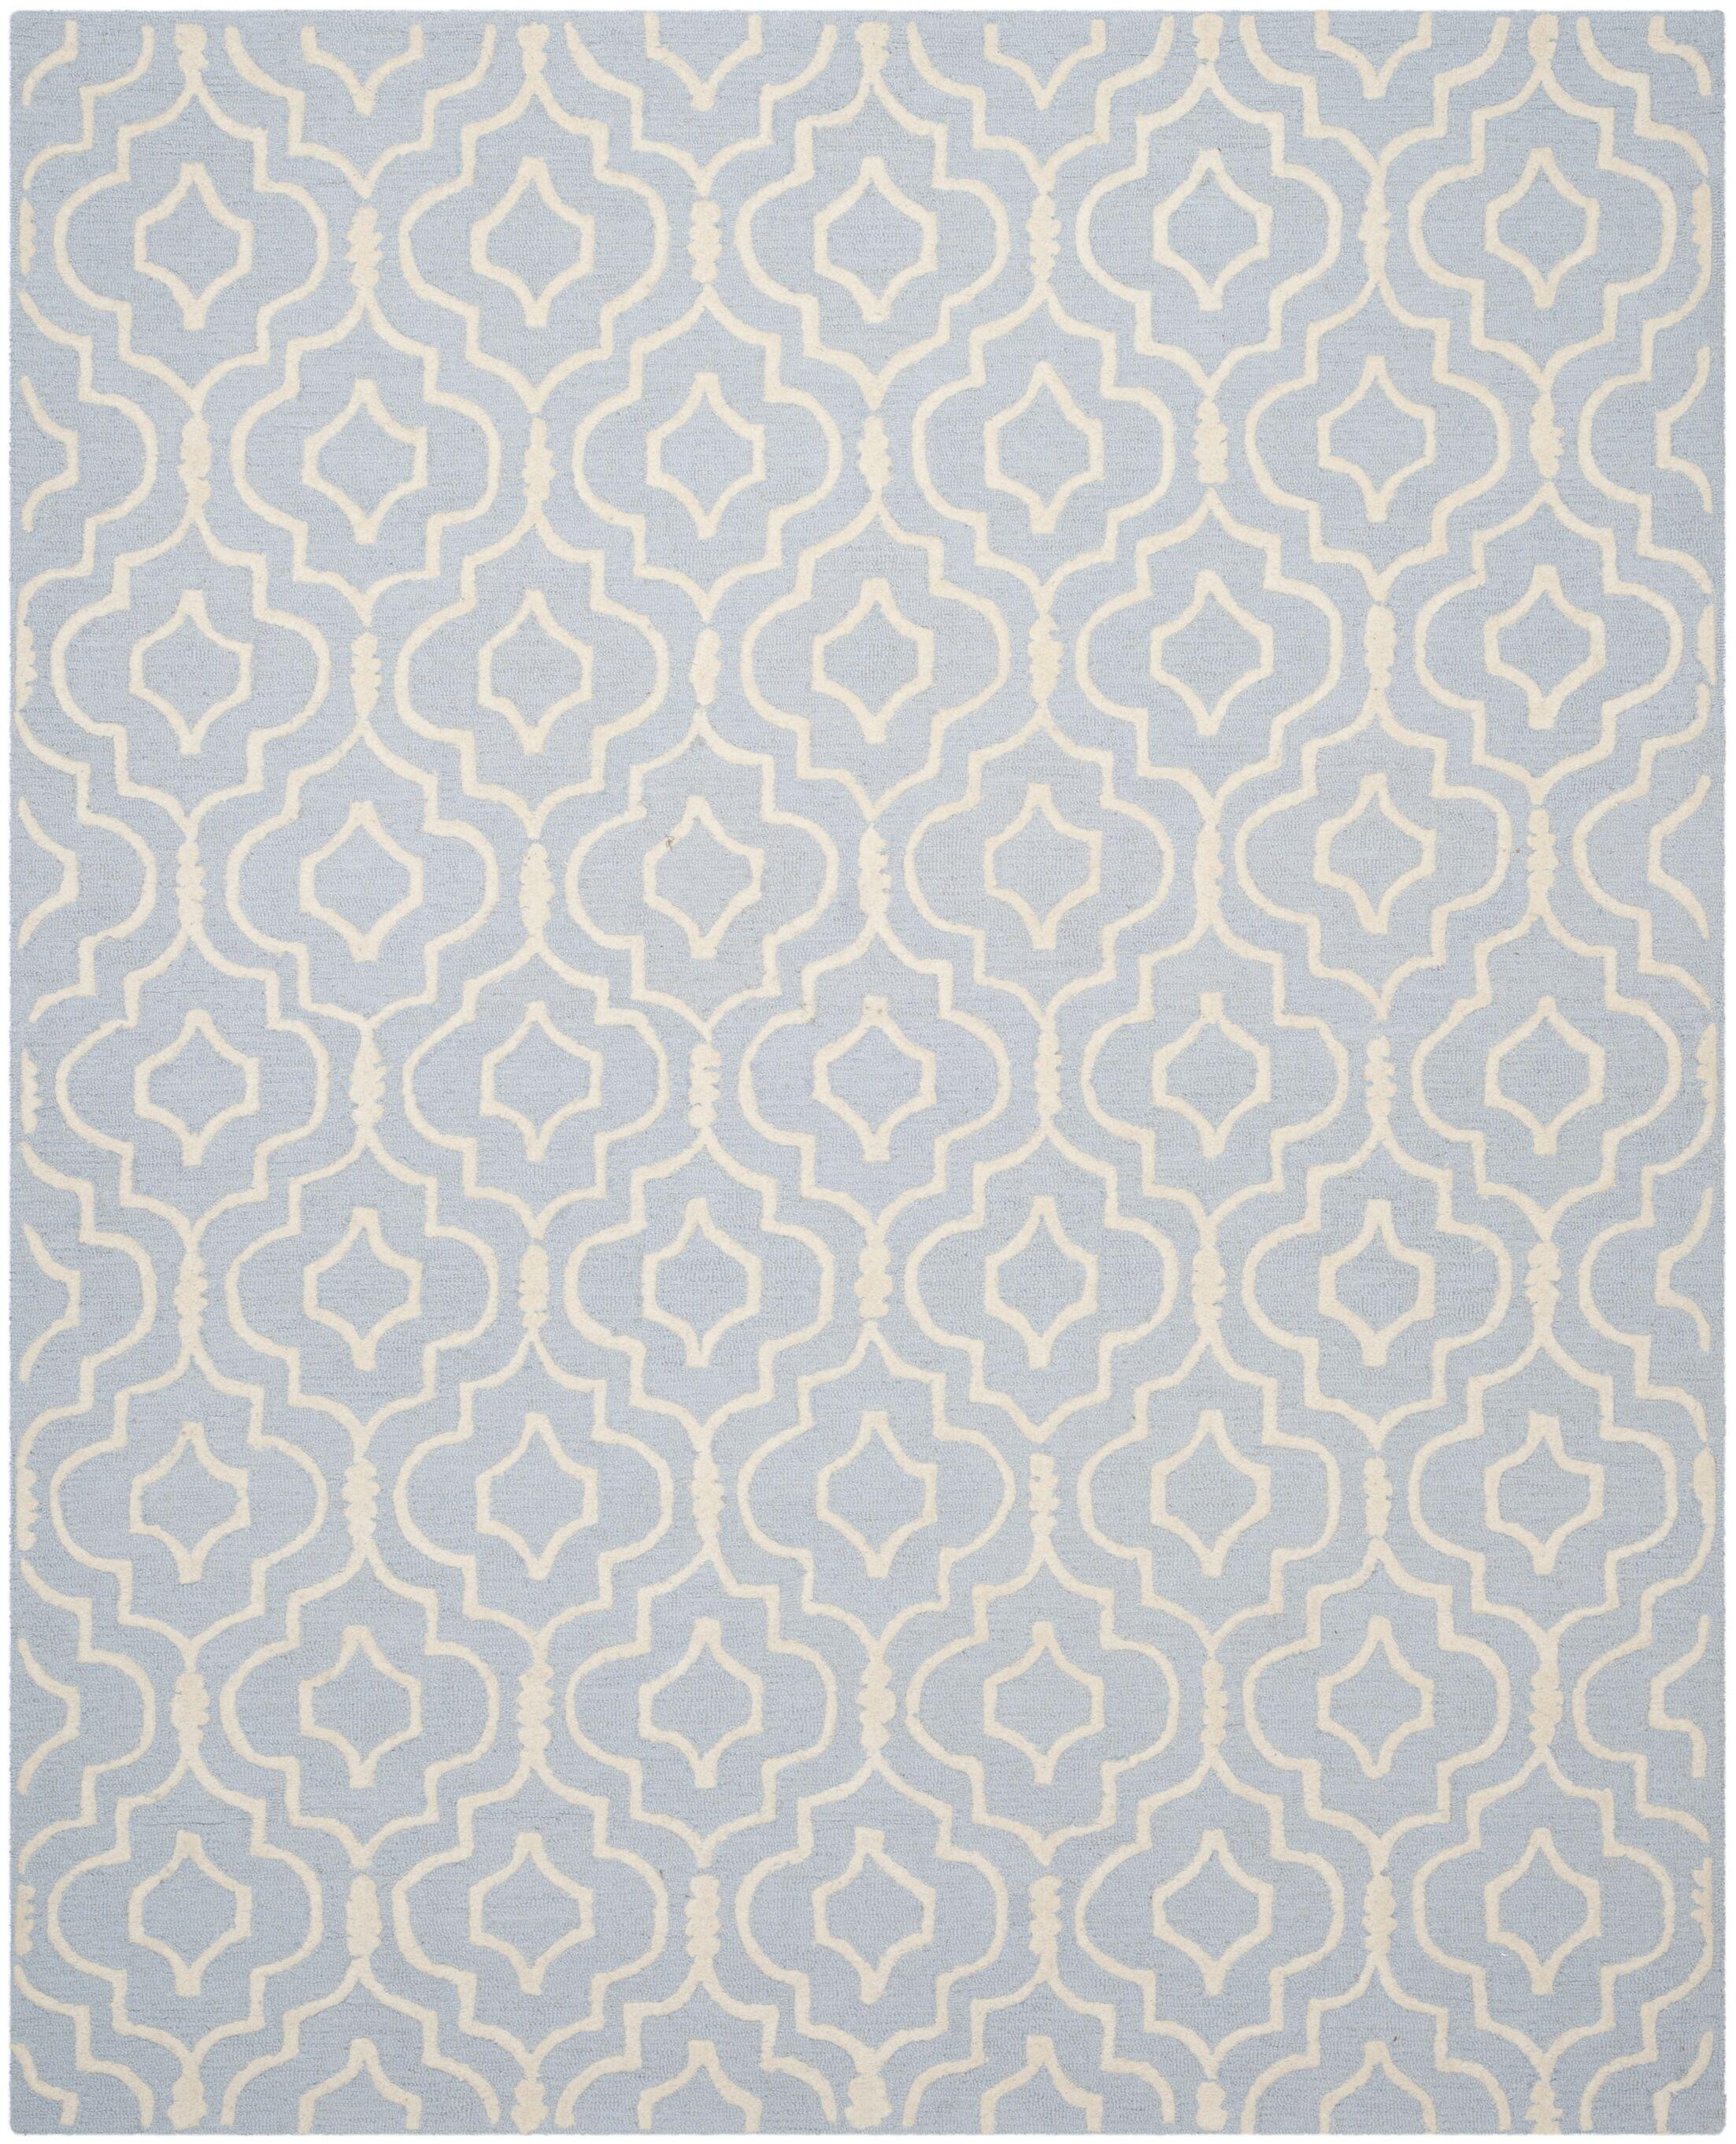 Martins Hand-Tufted Light Blue/Ivory Area Rug Rug Size: Rectangle 8' x 10'